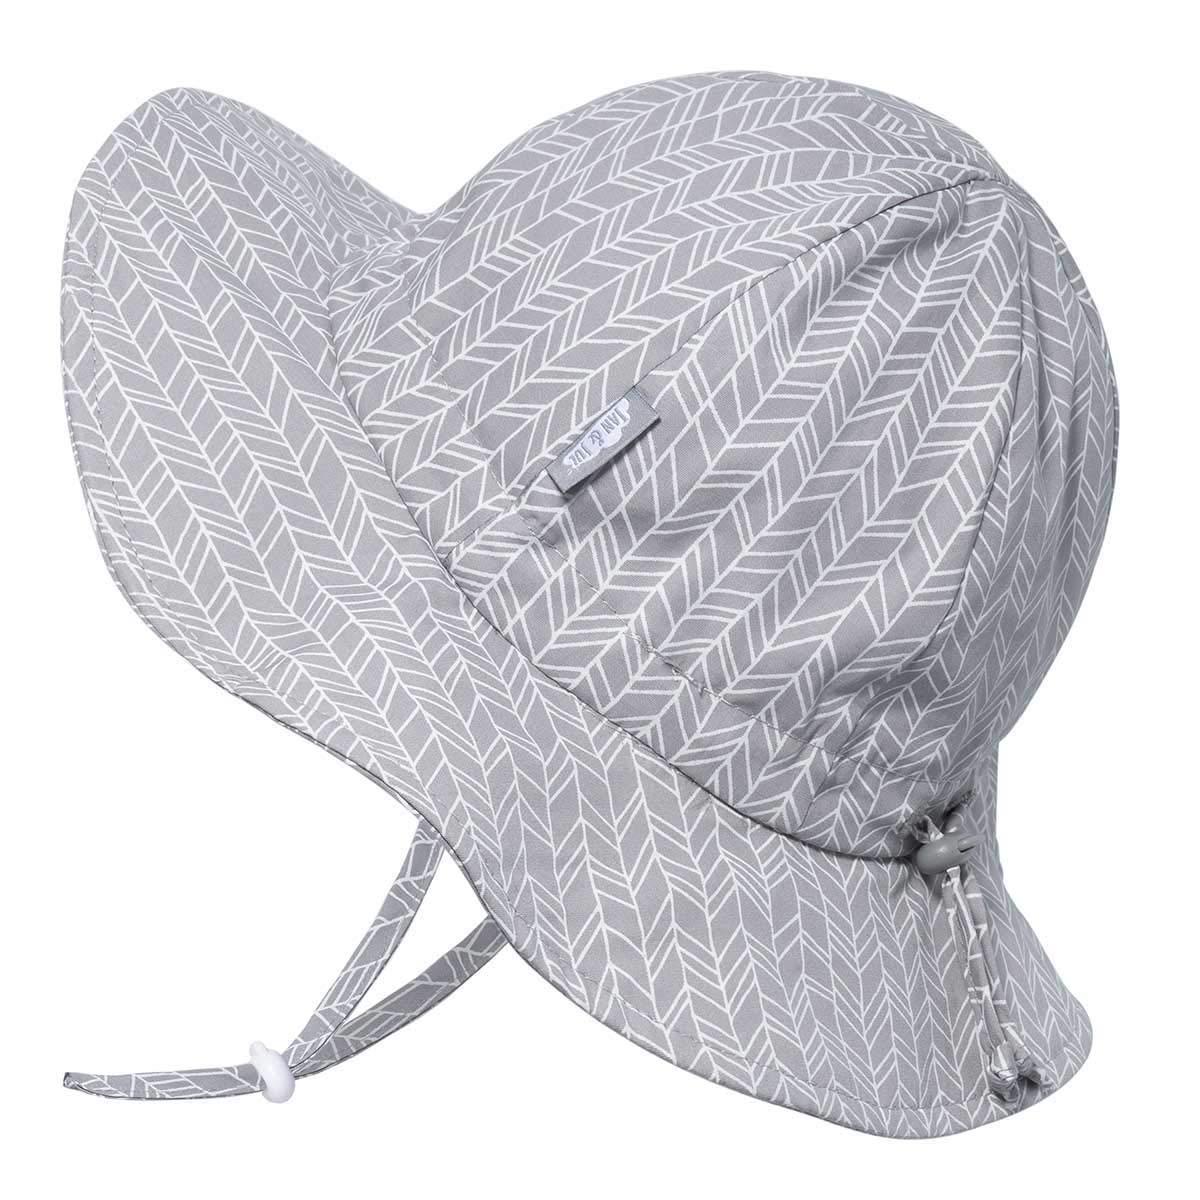 Toddler Boys Girls Cotton Sun Hats 50 UPF, Drawstring Adjustable, Stay-on Tie (M: 6-24m, Grey Herringbone)